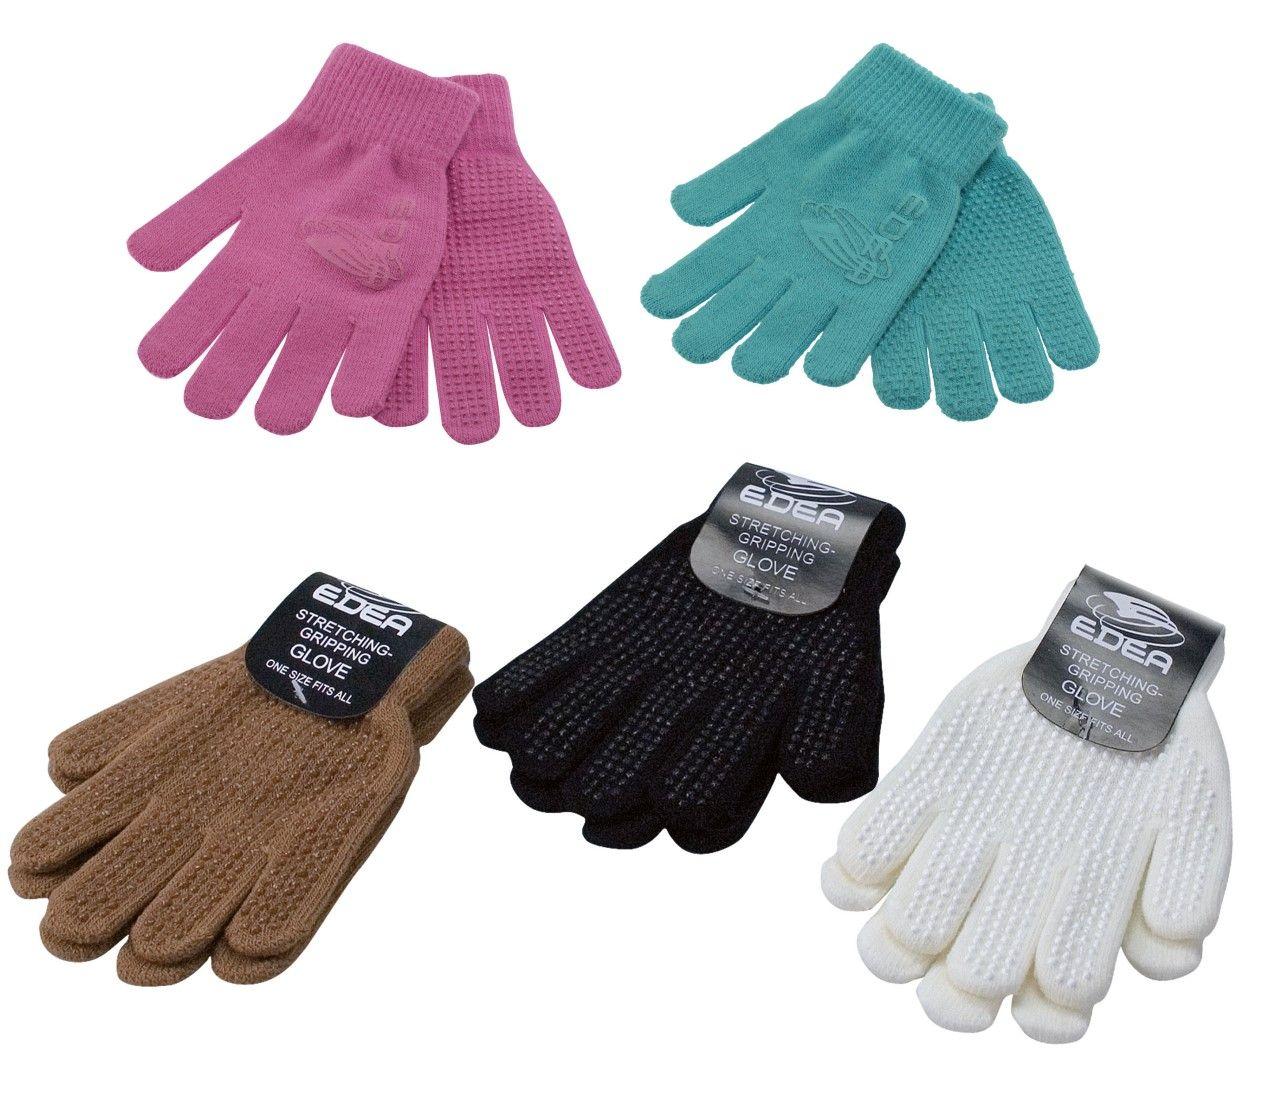 Edea gripping gloves